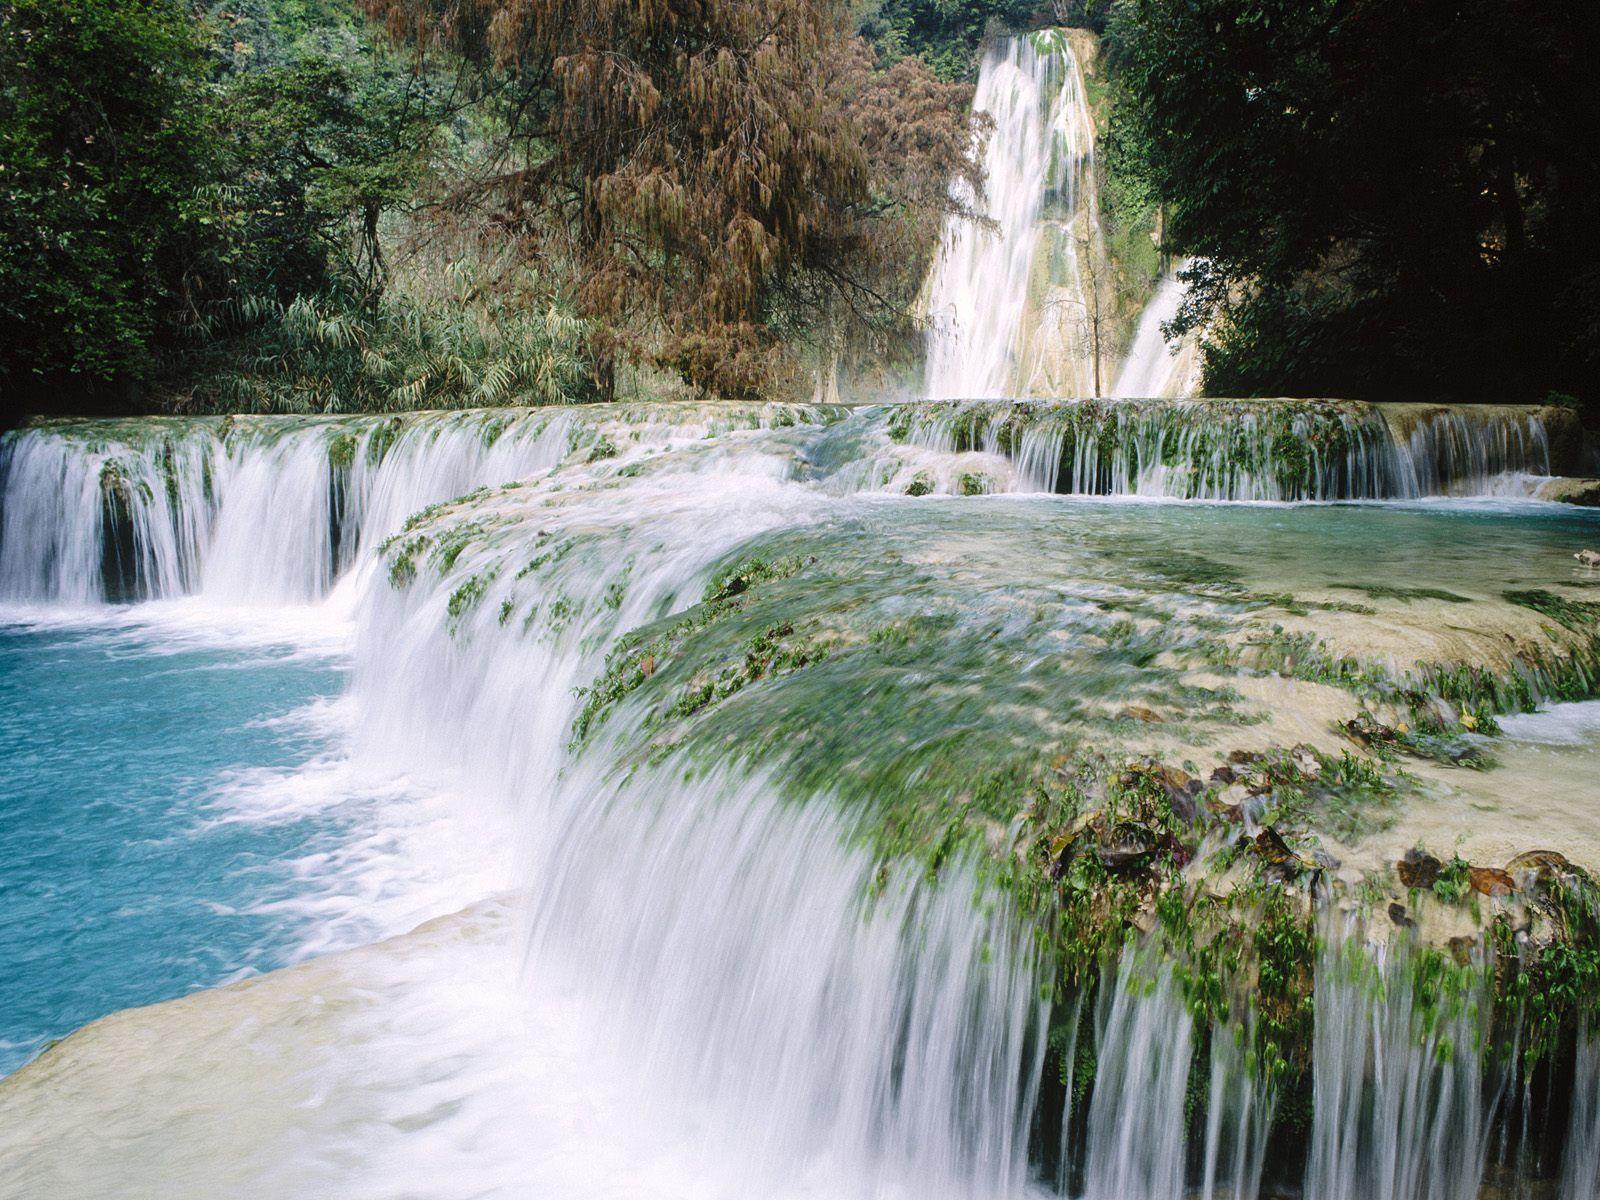 Mexico Minas Viejas Waterfalls Travel World Natural Waterfalls Beautiful Waterfalls Mexico Wallpaper